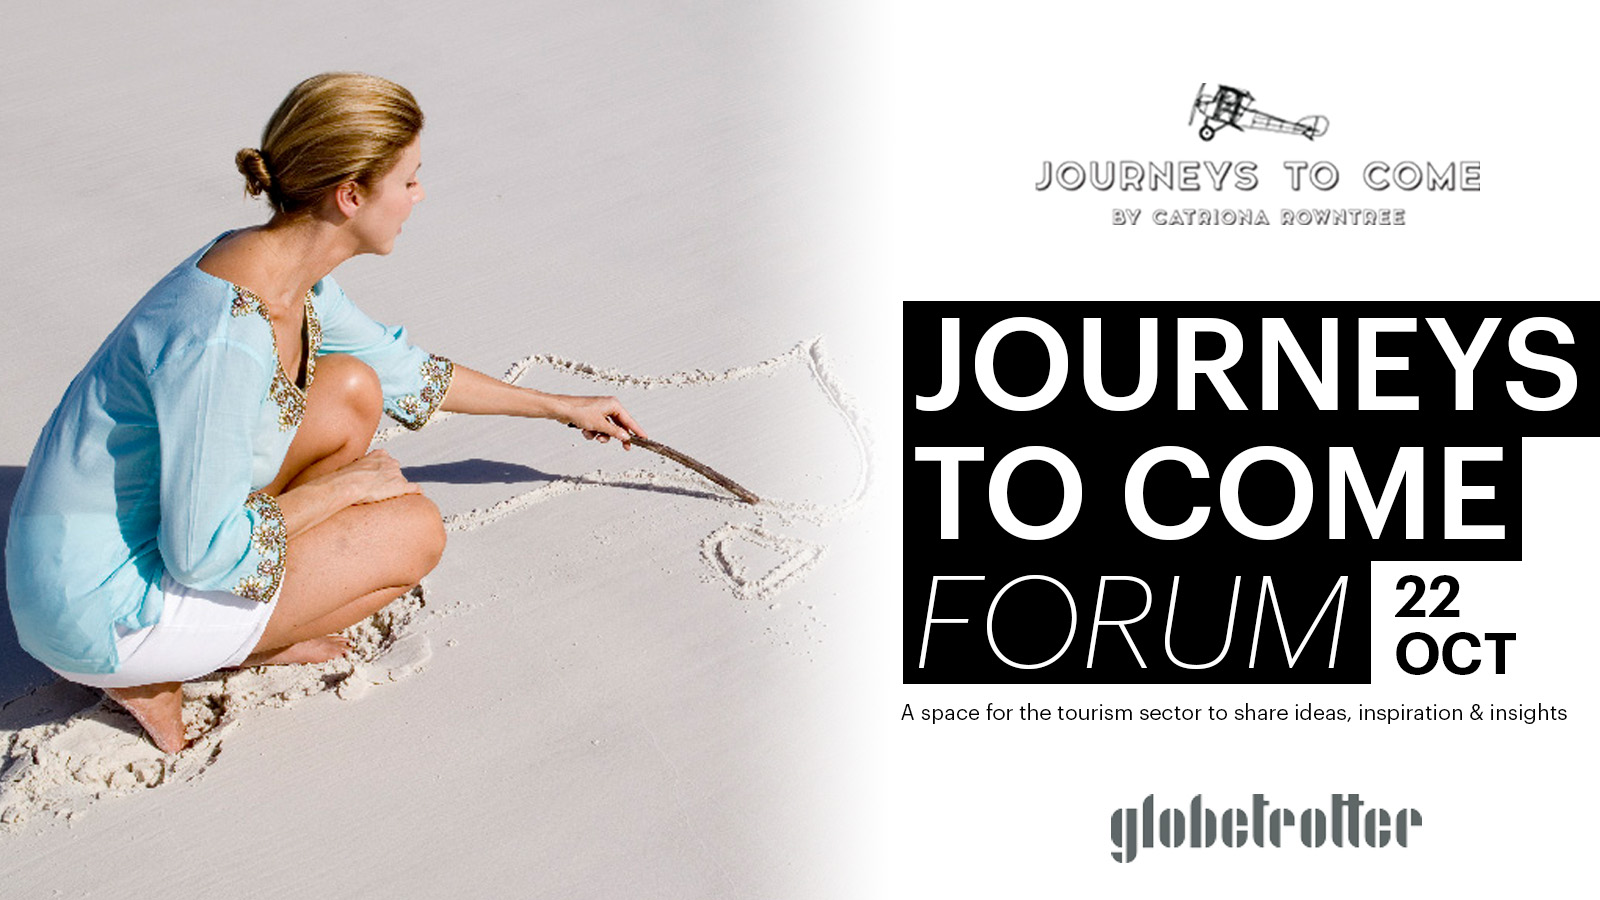 Register now for 22 October Forum